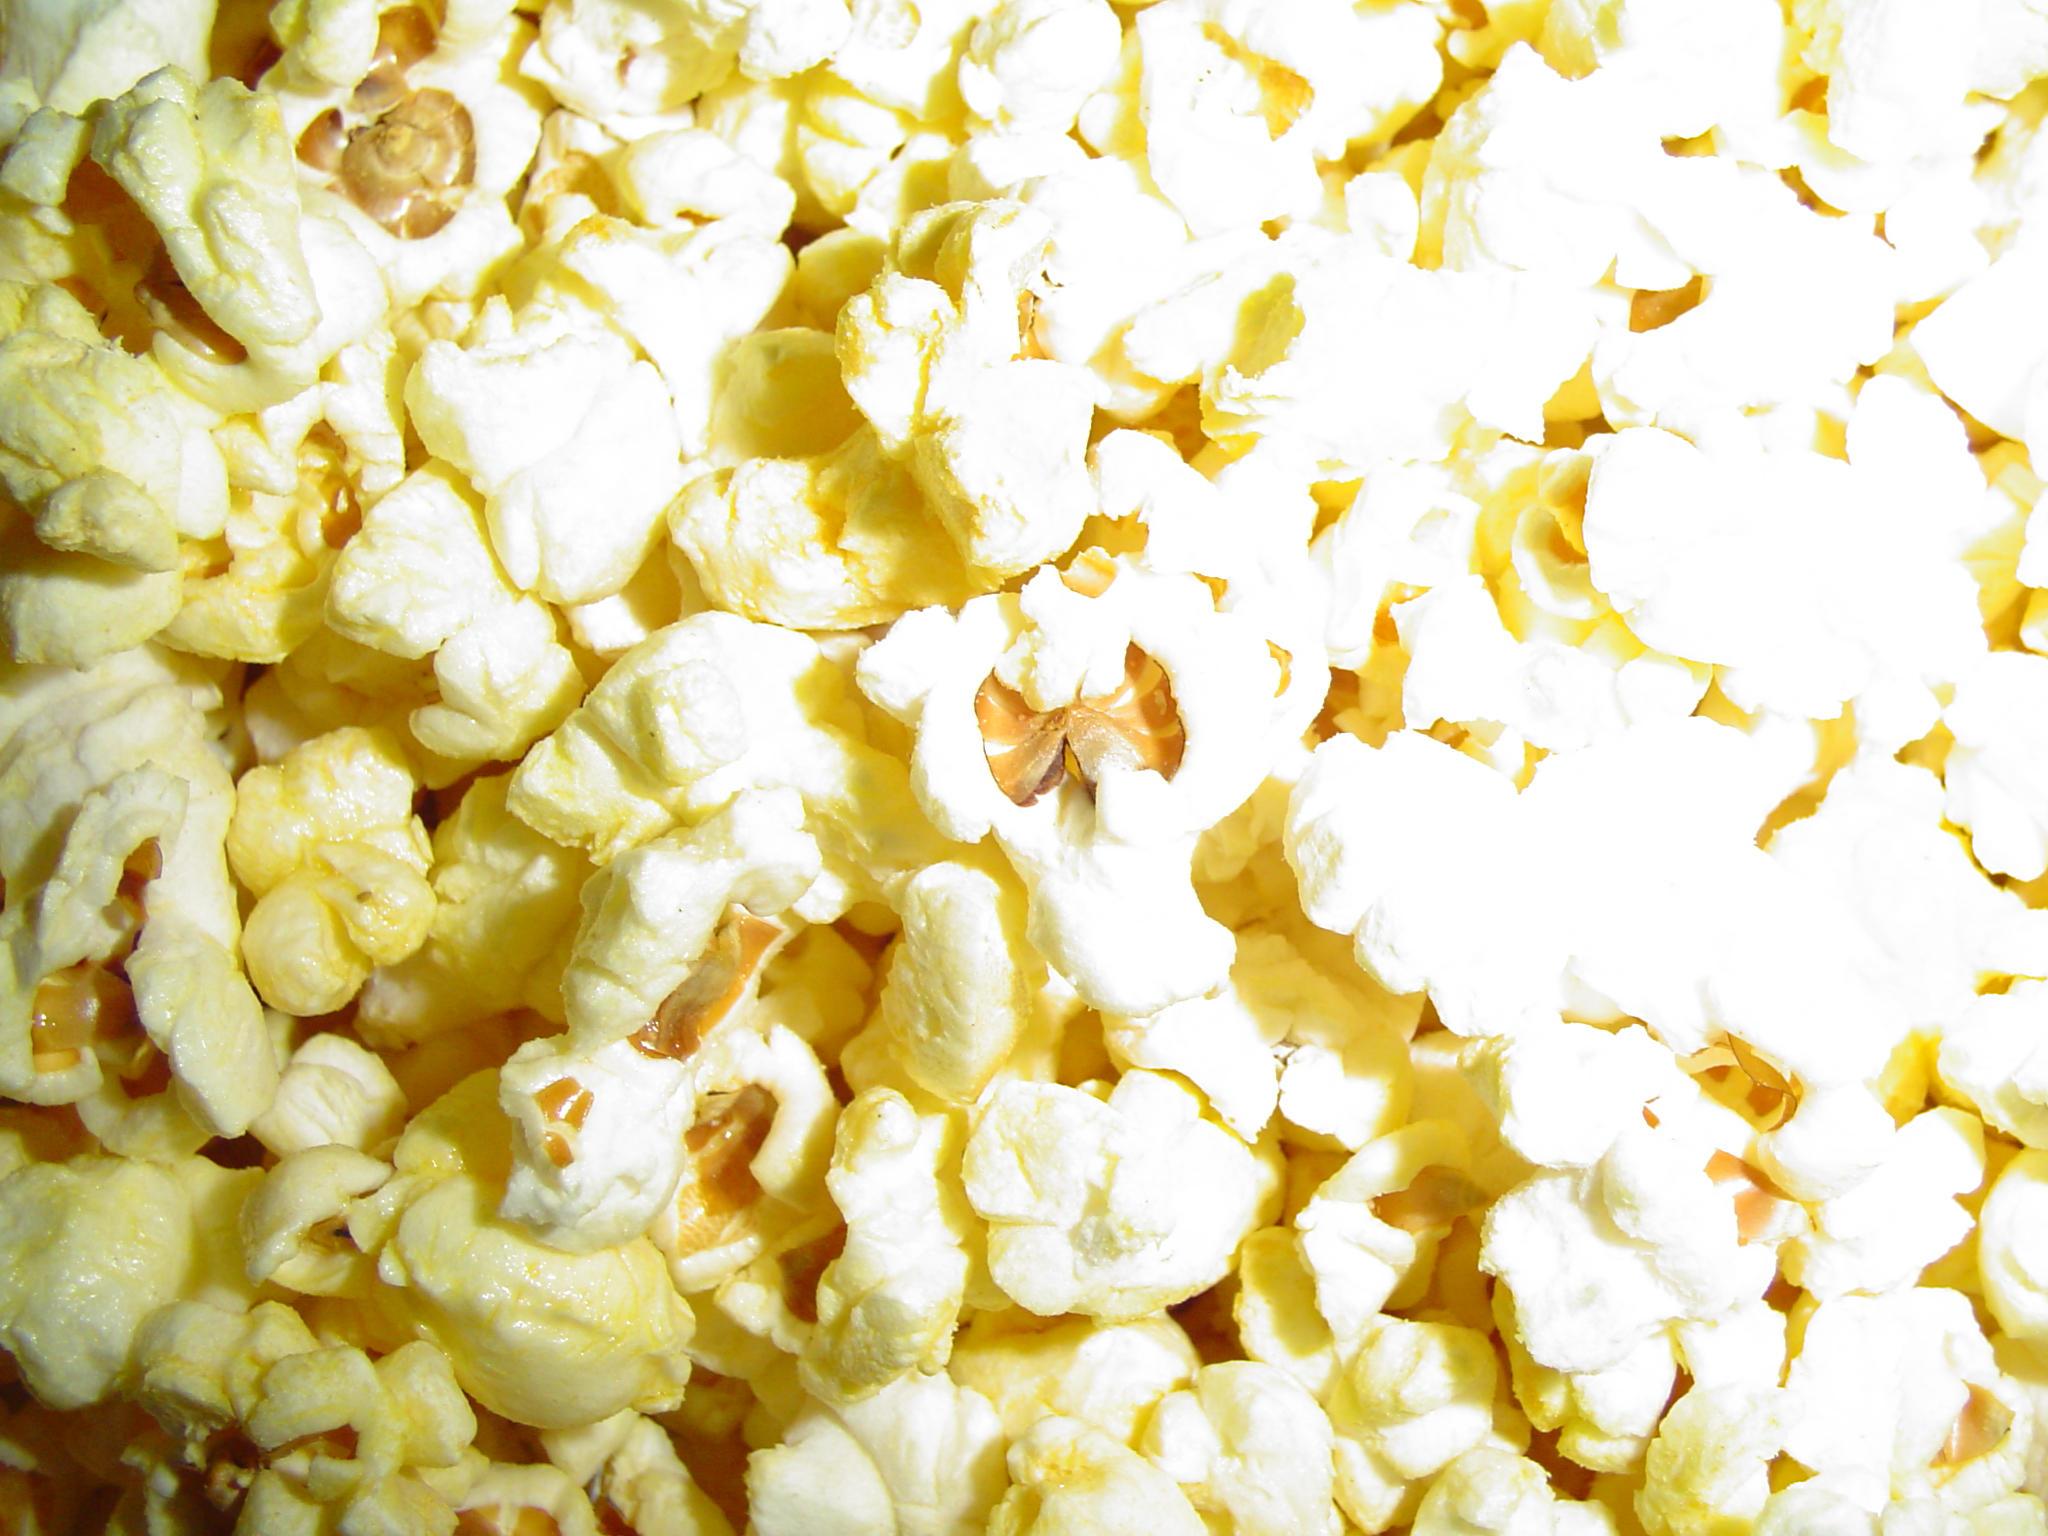 popcorn by shuffler